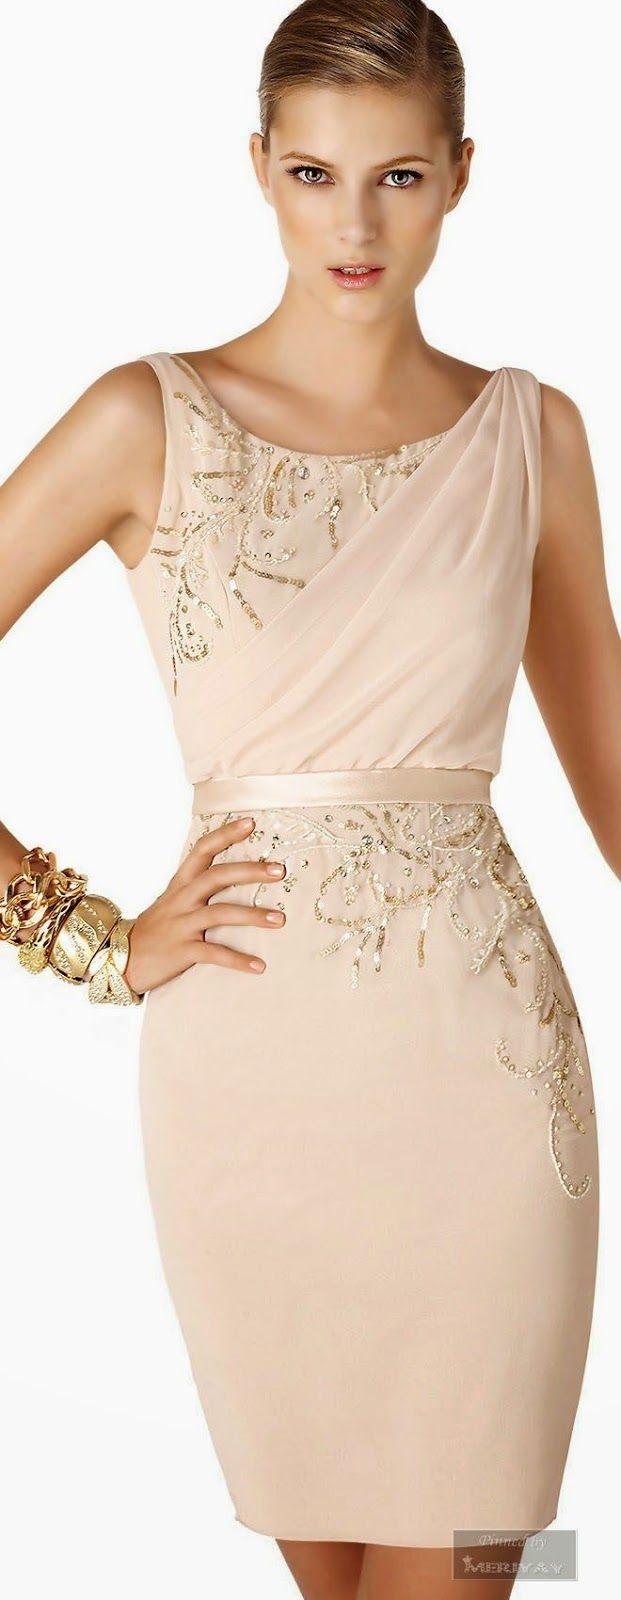 Women's fashion   Elegant sleeveless dress